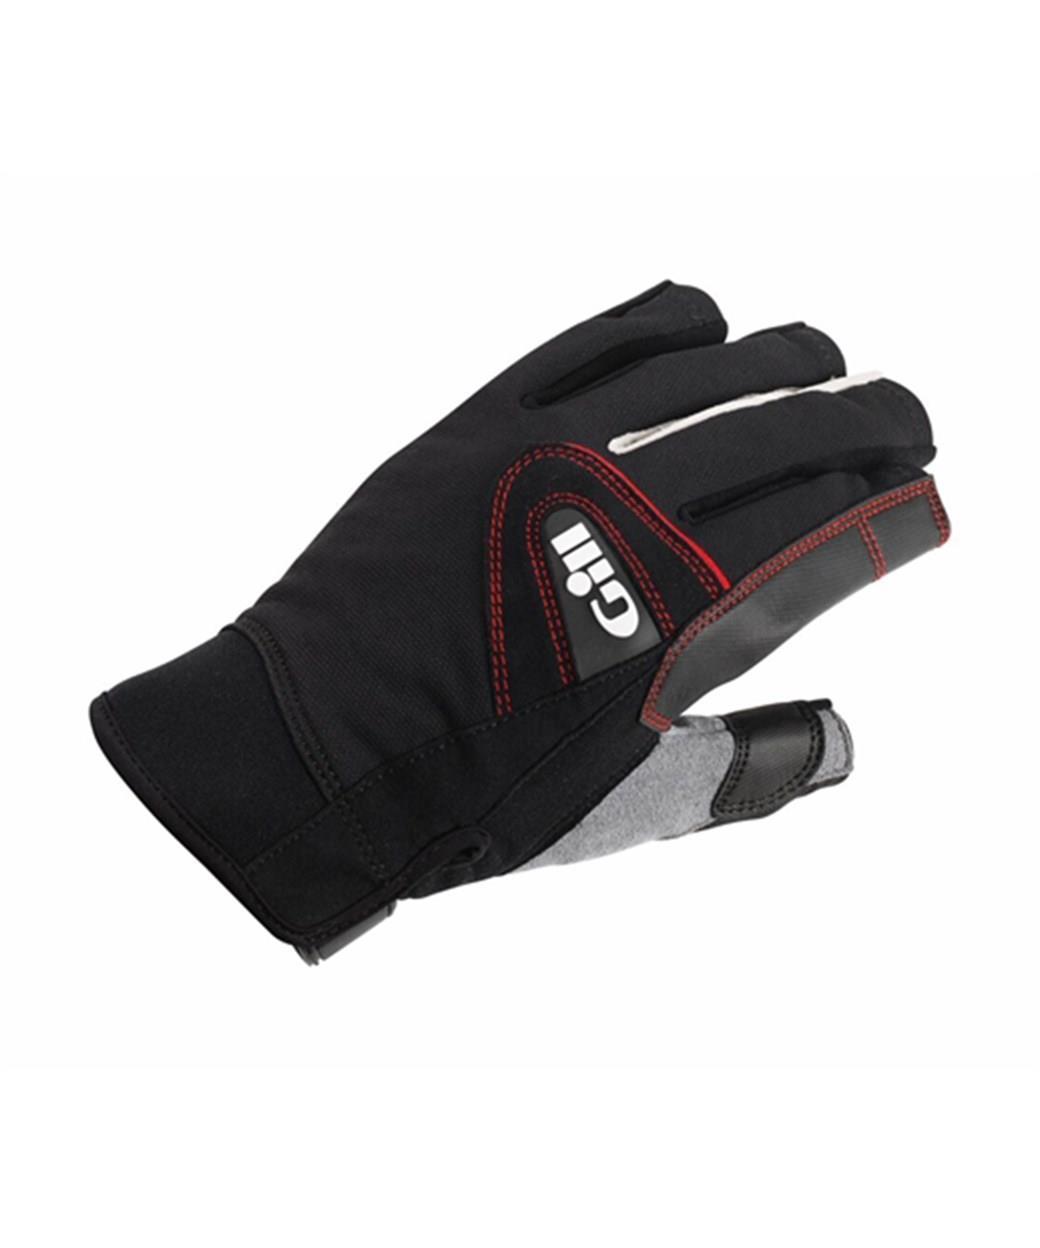 Champıonshıp Gloves Short Fıngered Gil.7242